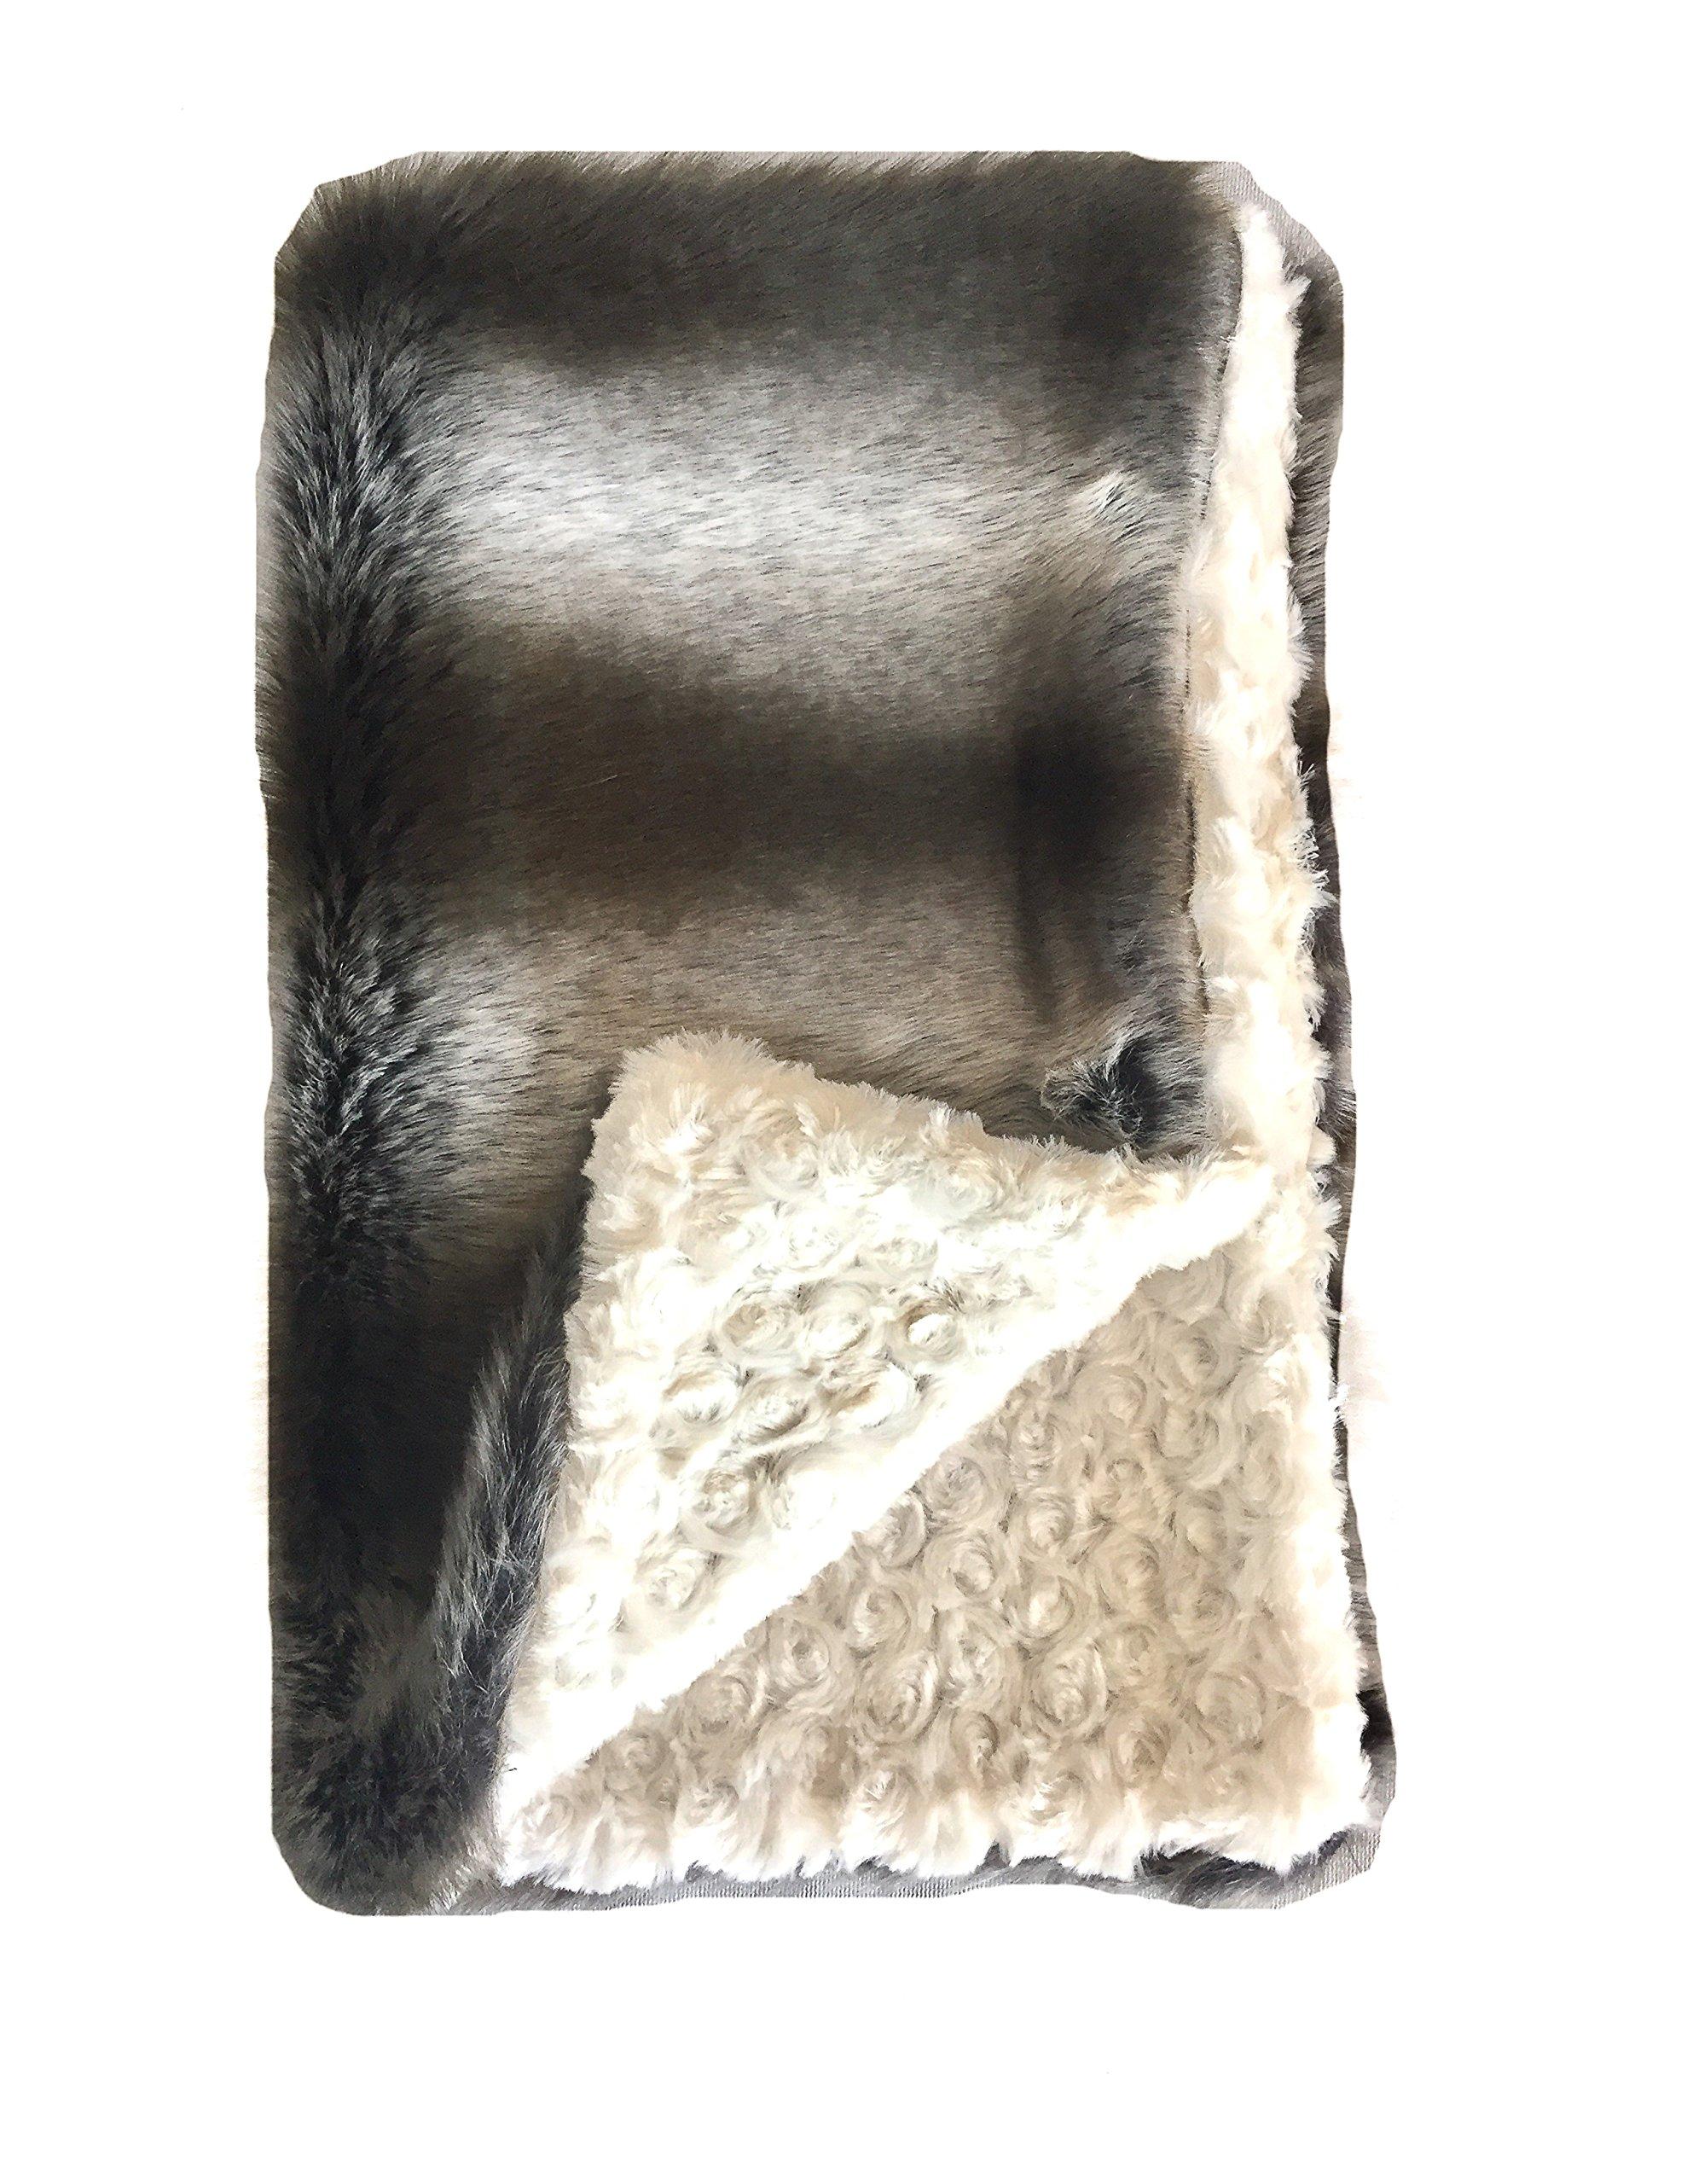 GoodDogBeds 15 by 18-Inch Faux Fur BaaBaa Dog Blanket, Small, Grey Chinchilla